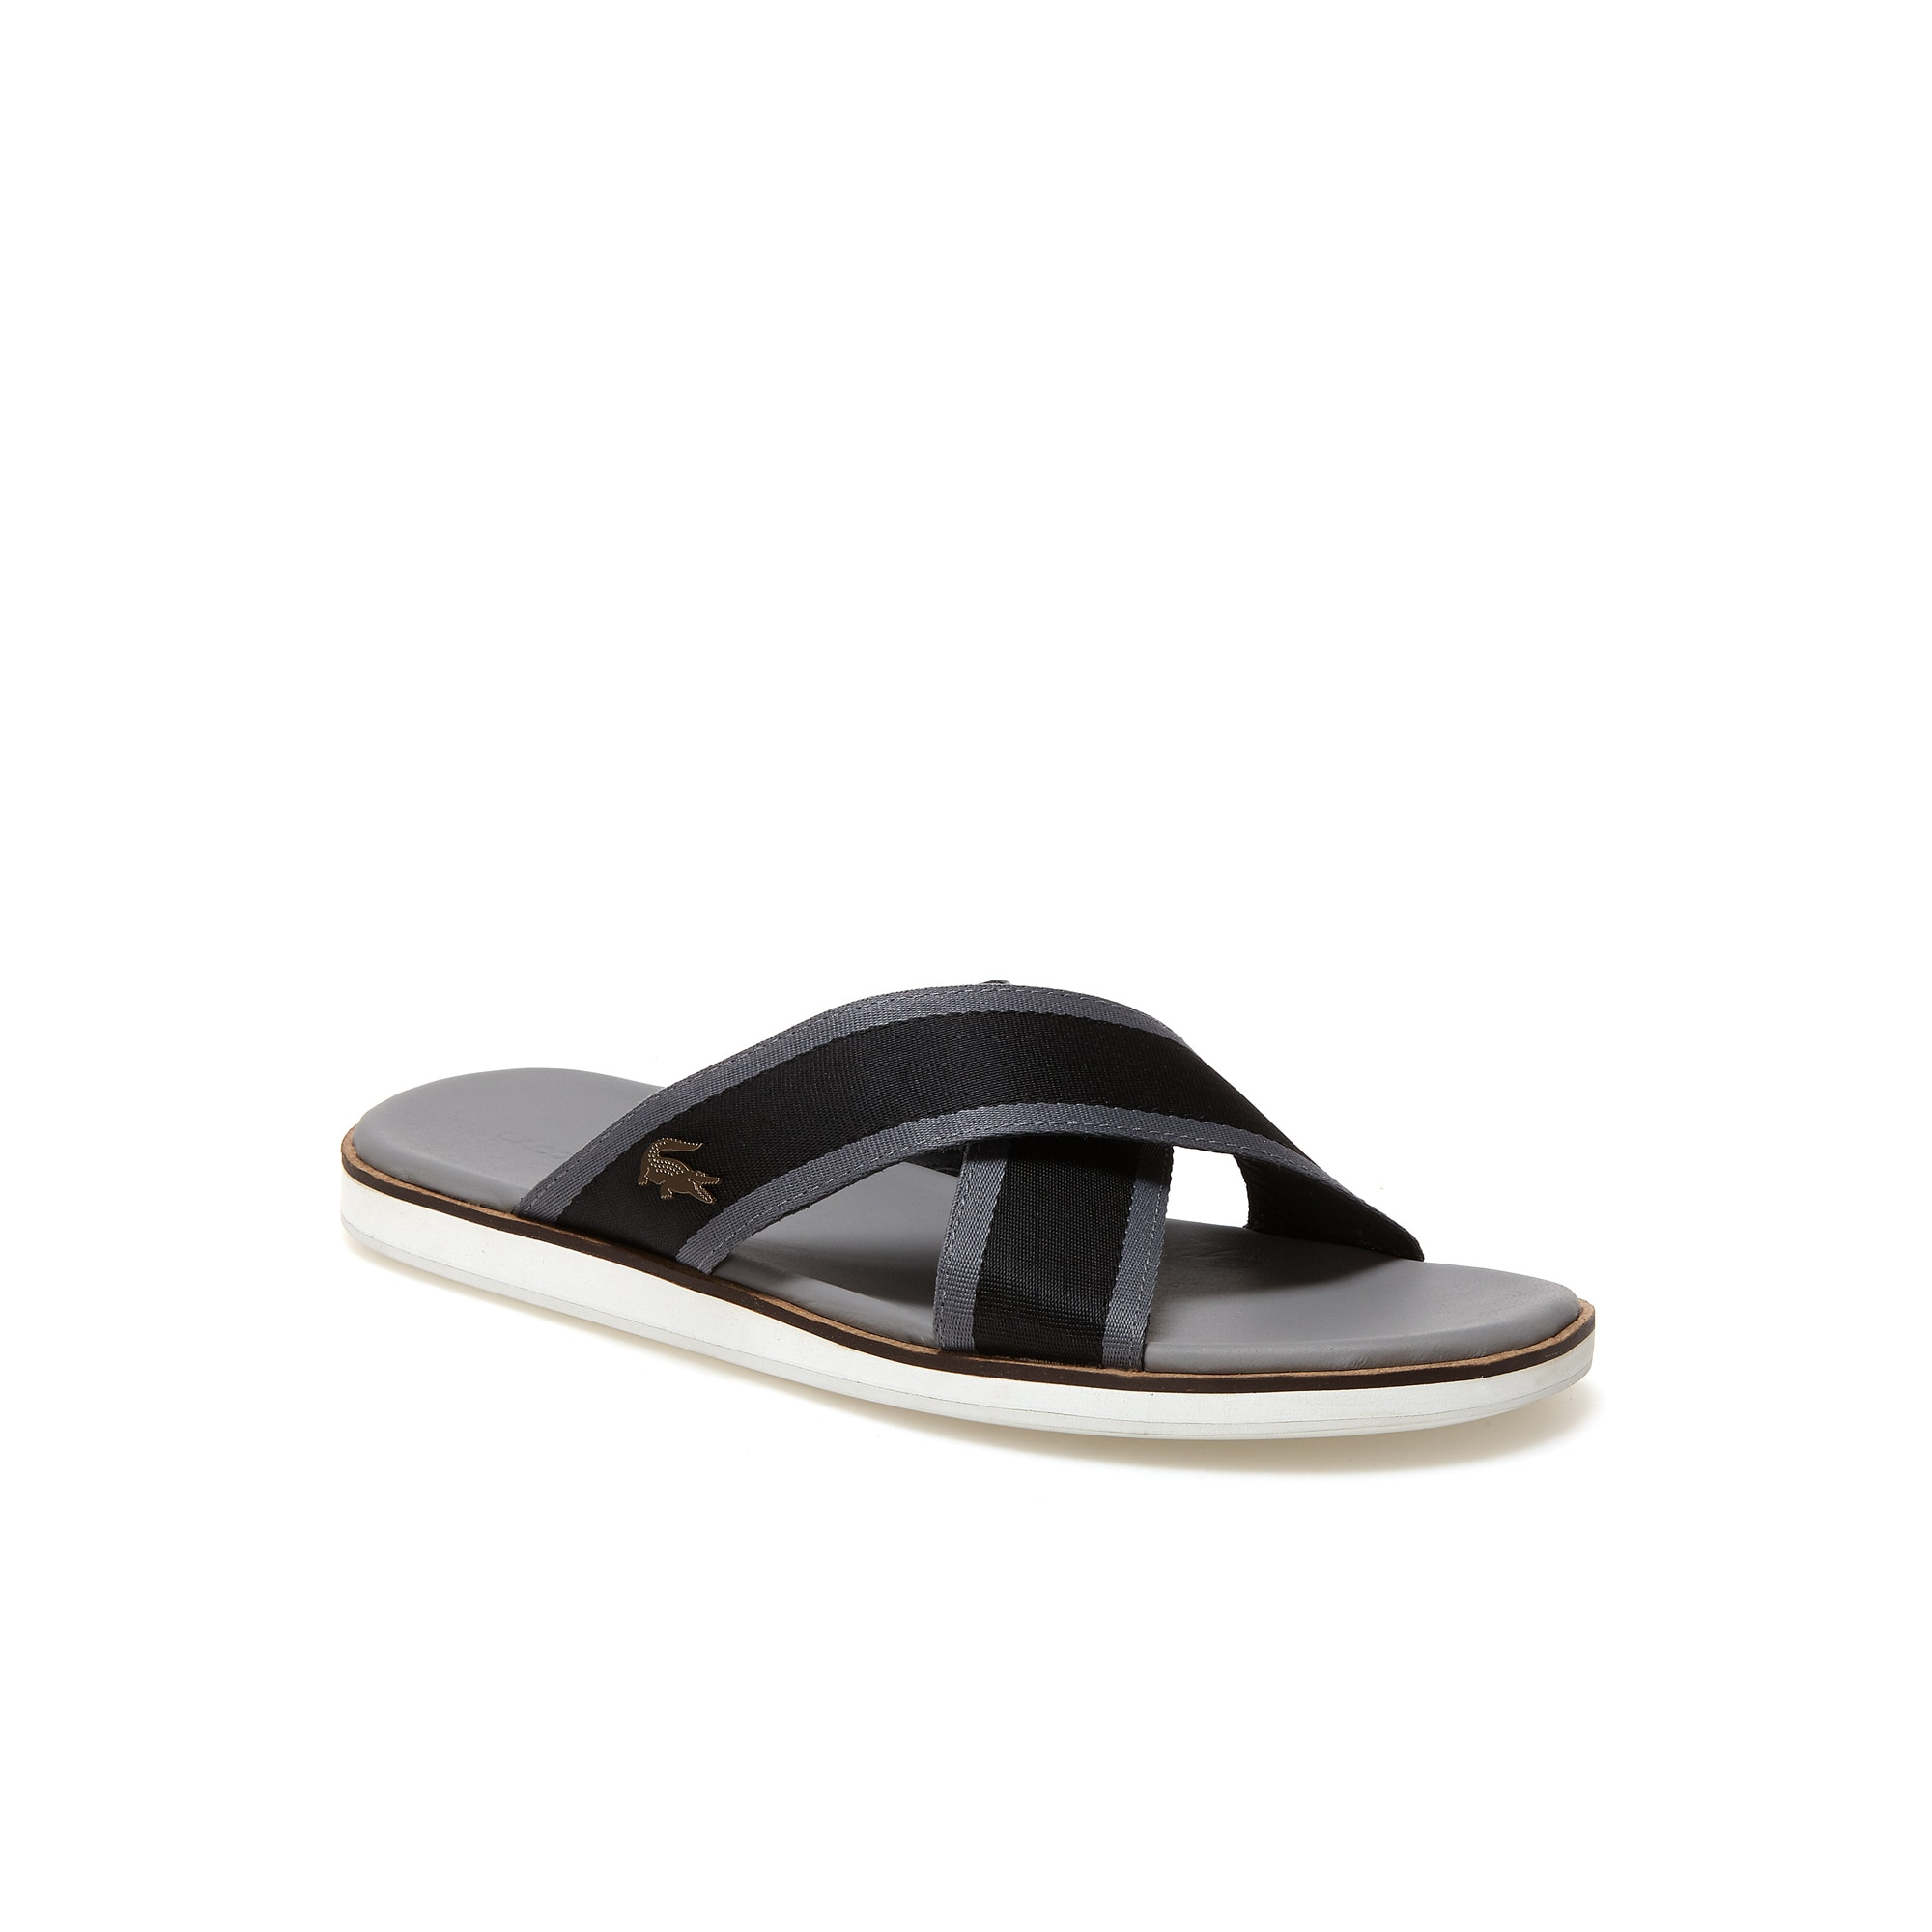 Men's Coupri Leather Sandals